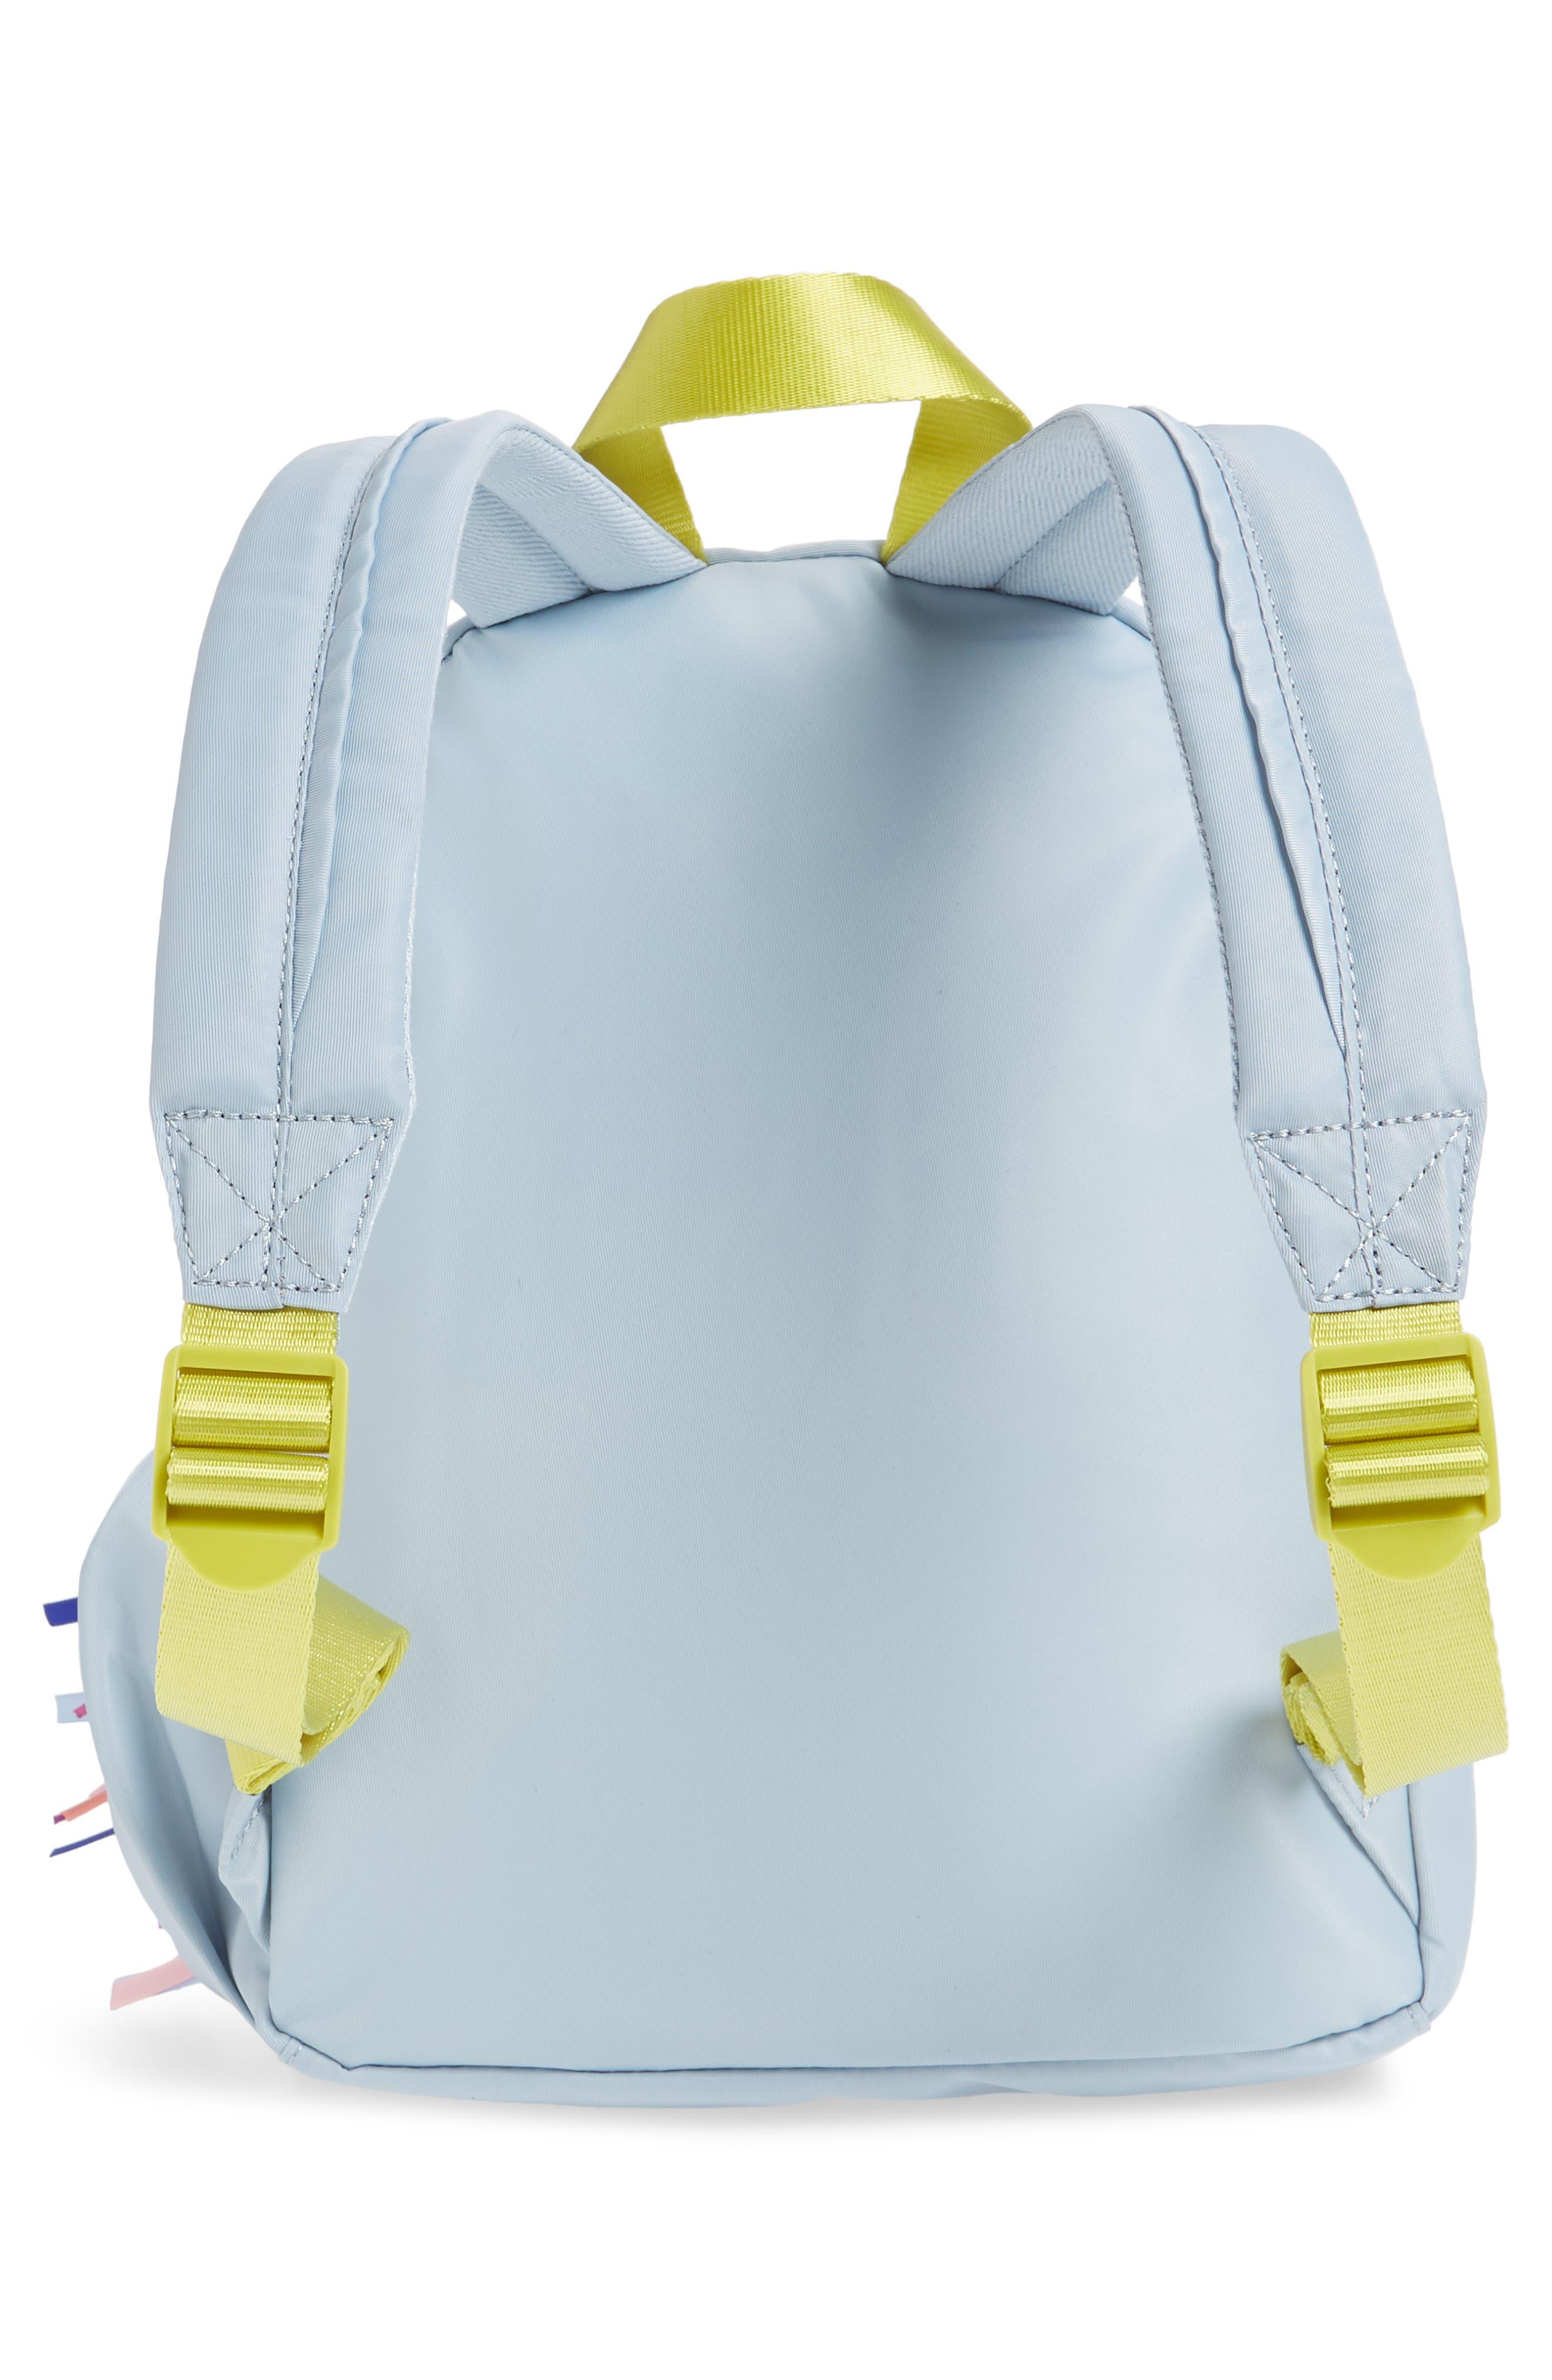 CREWCUTS BY J.CREW,                             Unicorn Mini Backpack,                             Alternate thumbnail 2, color,                             500